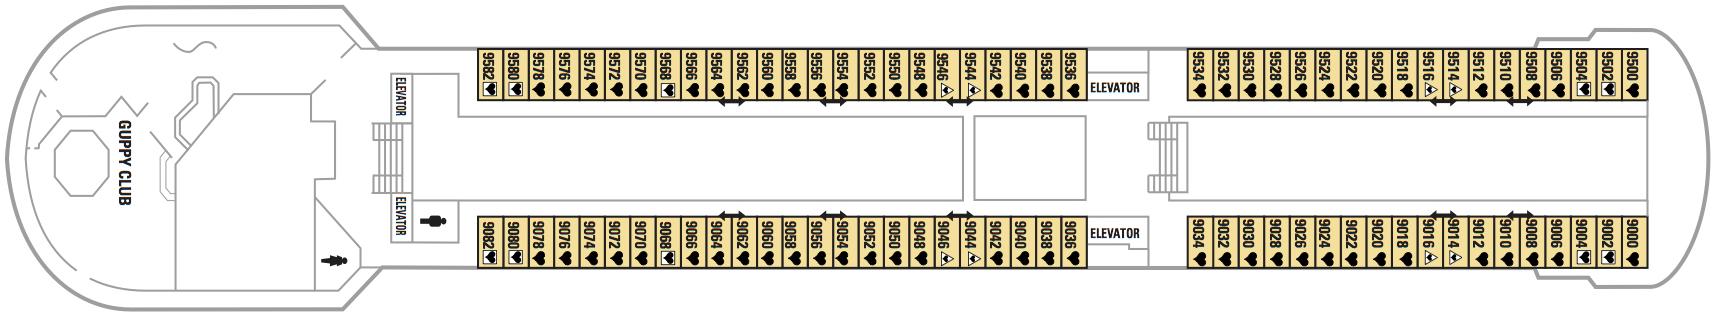 Pullmantur Sovereign Deck Plans Deck 9.jpg